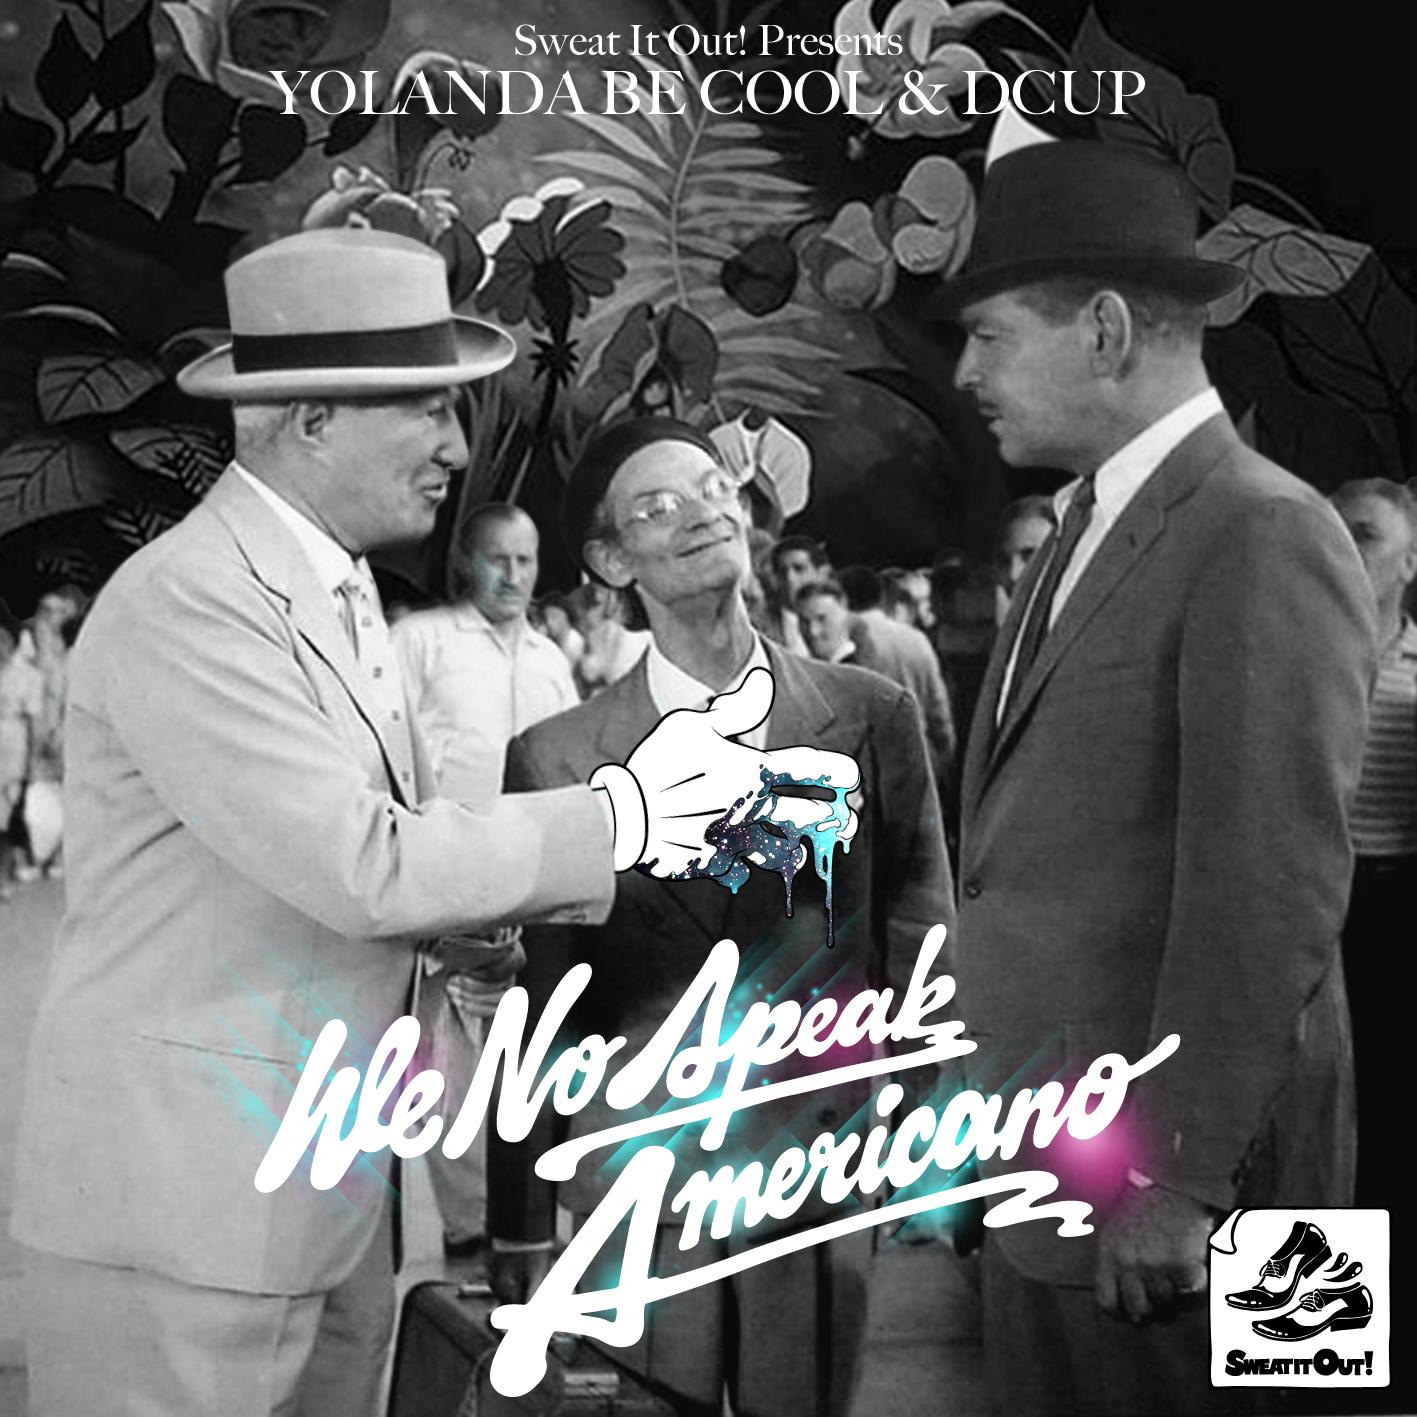 Yolanda Be Cool & Dcup Ft Dj Fito - We Speak No Americano (Remix)